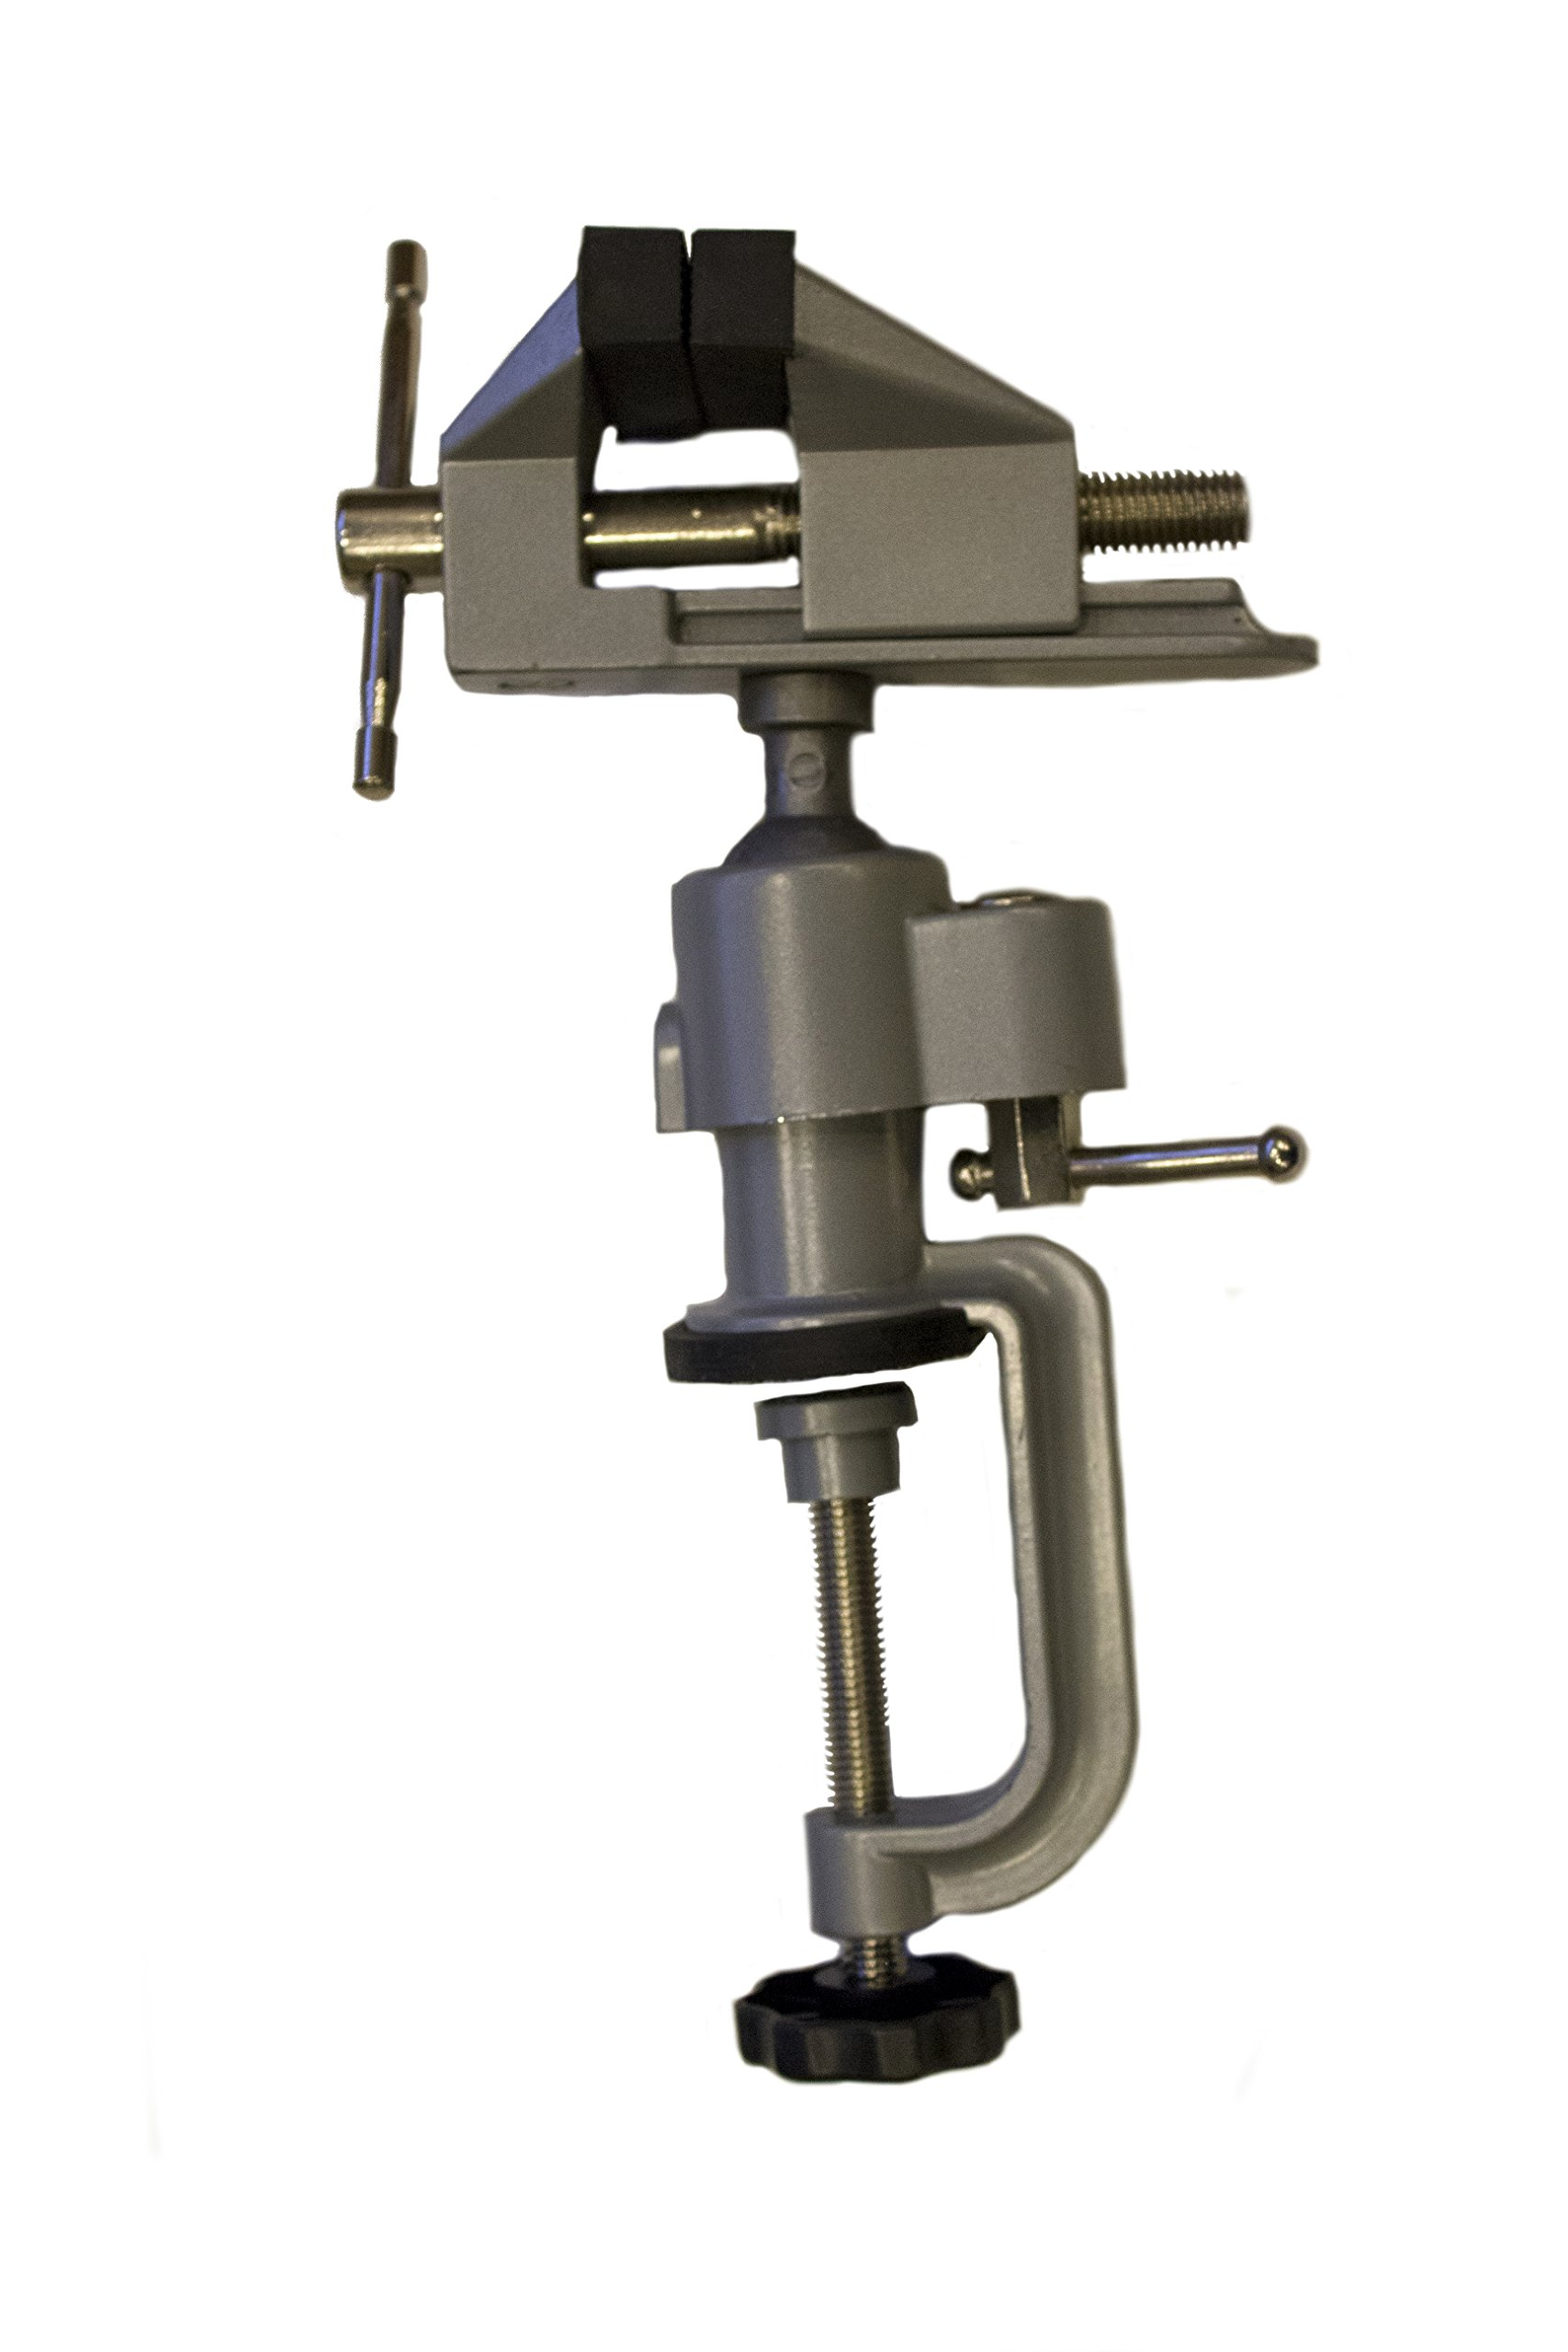 Yost Tools MVC-3 3'' Aluminum Vise